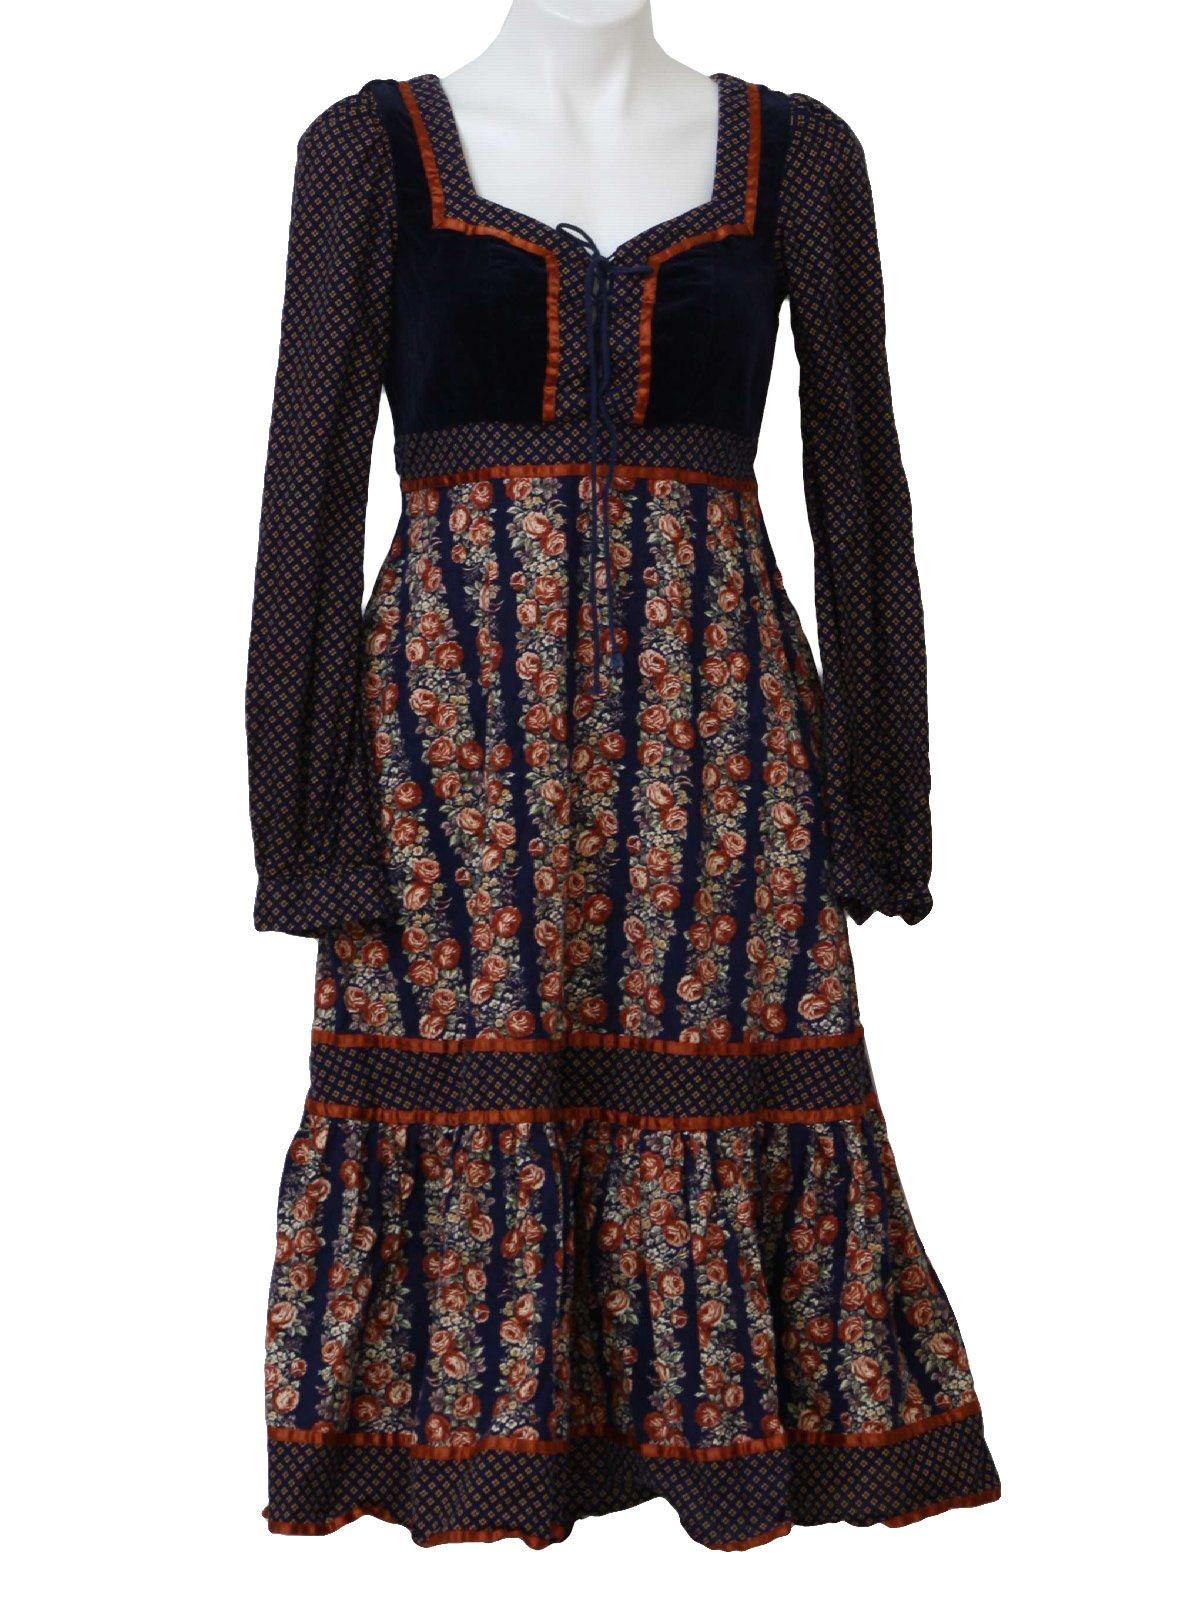 gunny sax patterns | Retro 1970's Dress (Gunne Sax) : 70s ...